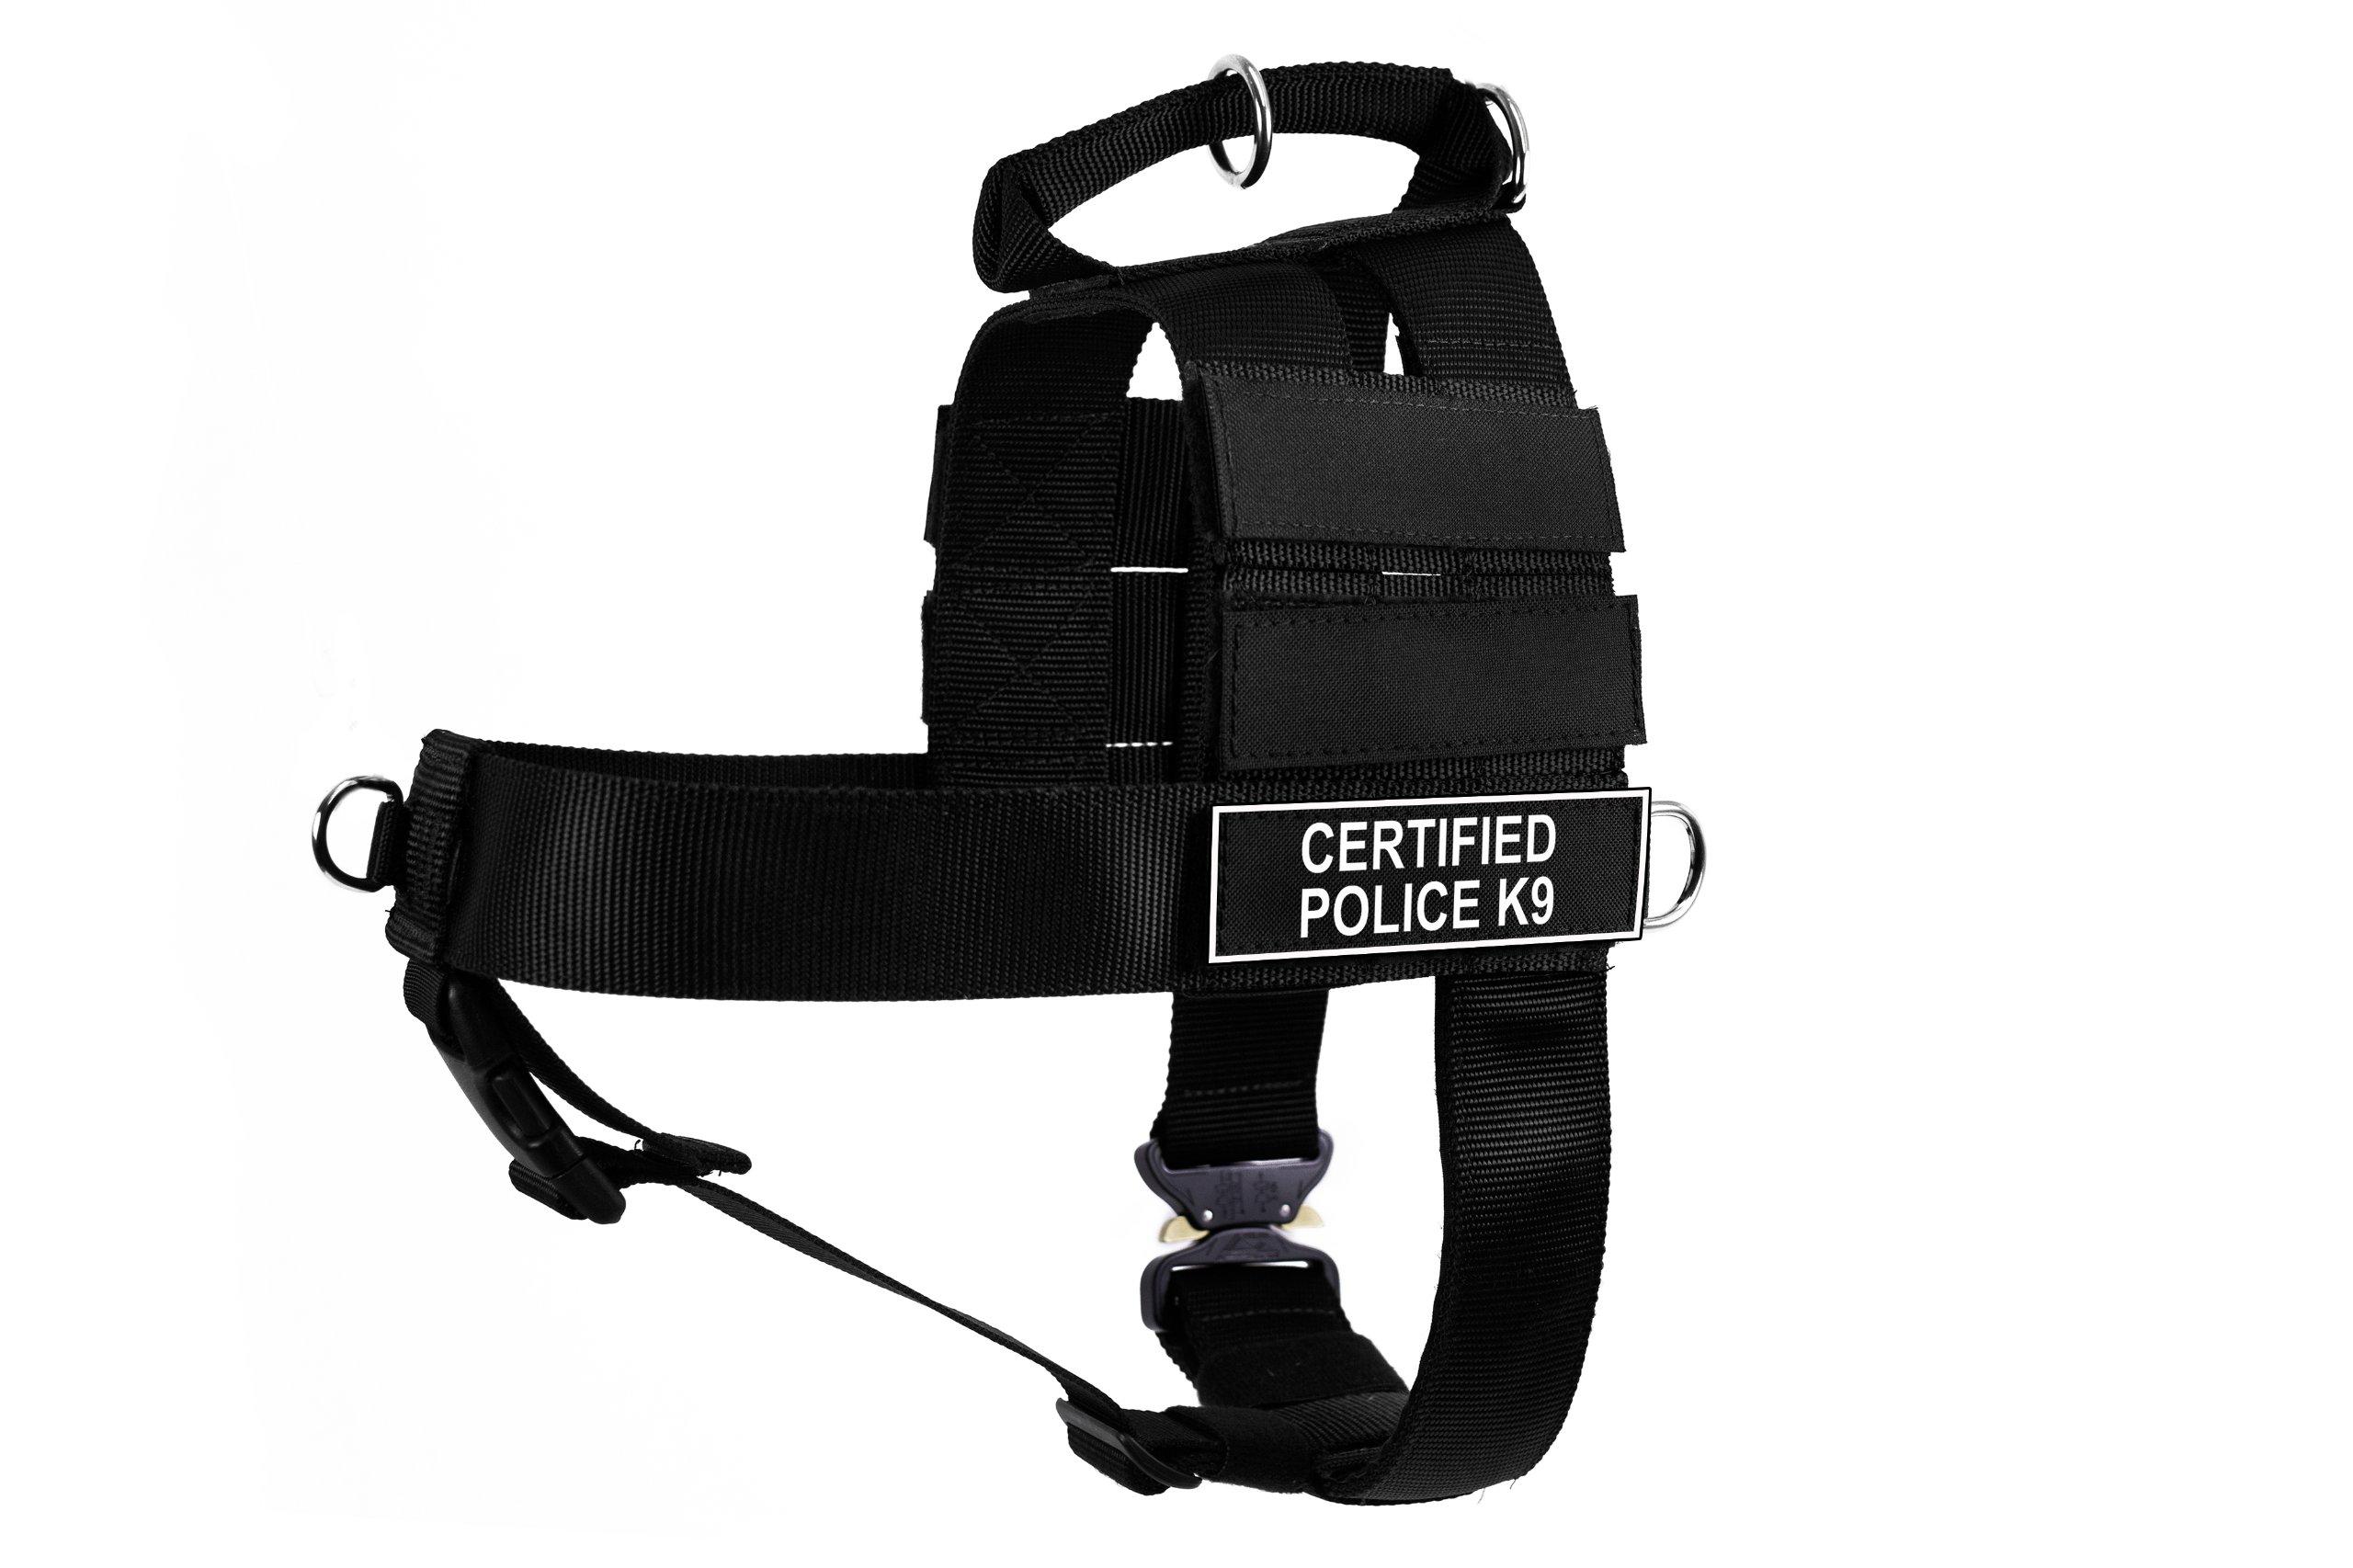 Dean & Tyler DT Cobra Certified Police K9 No Pull Harness, Medium, Black